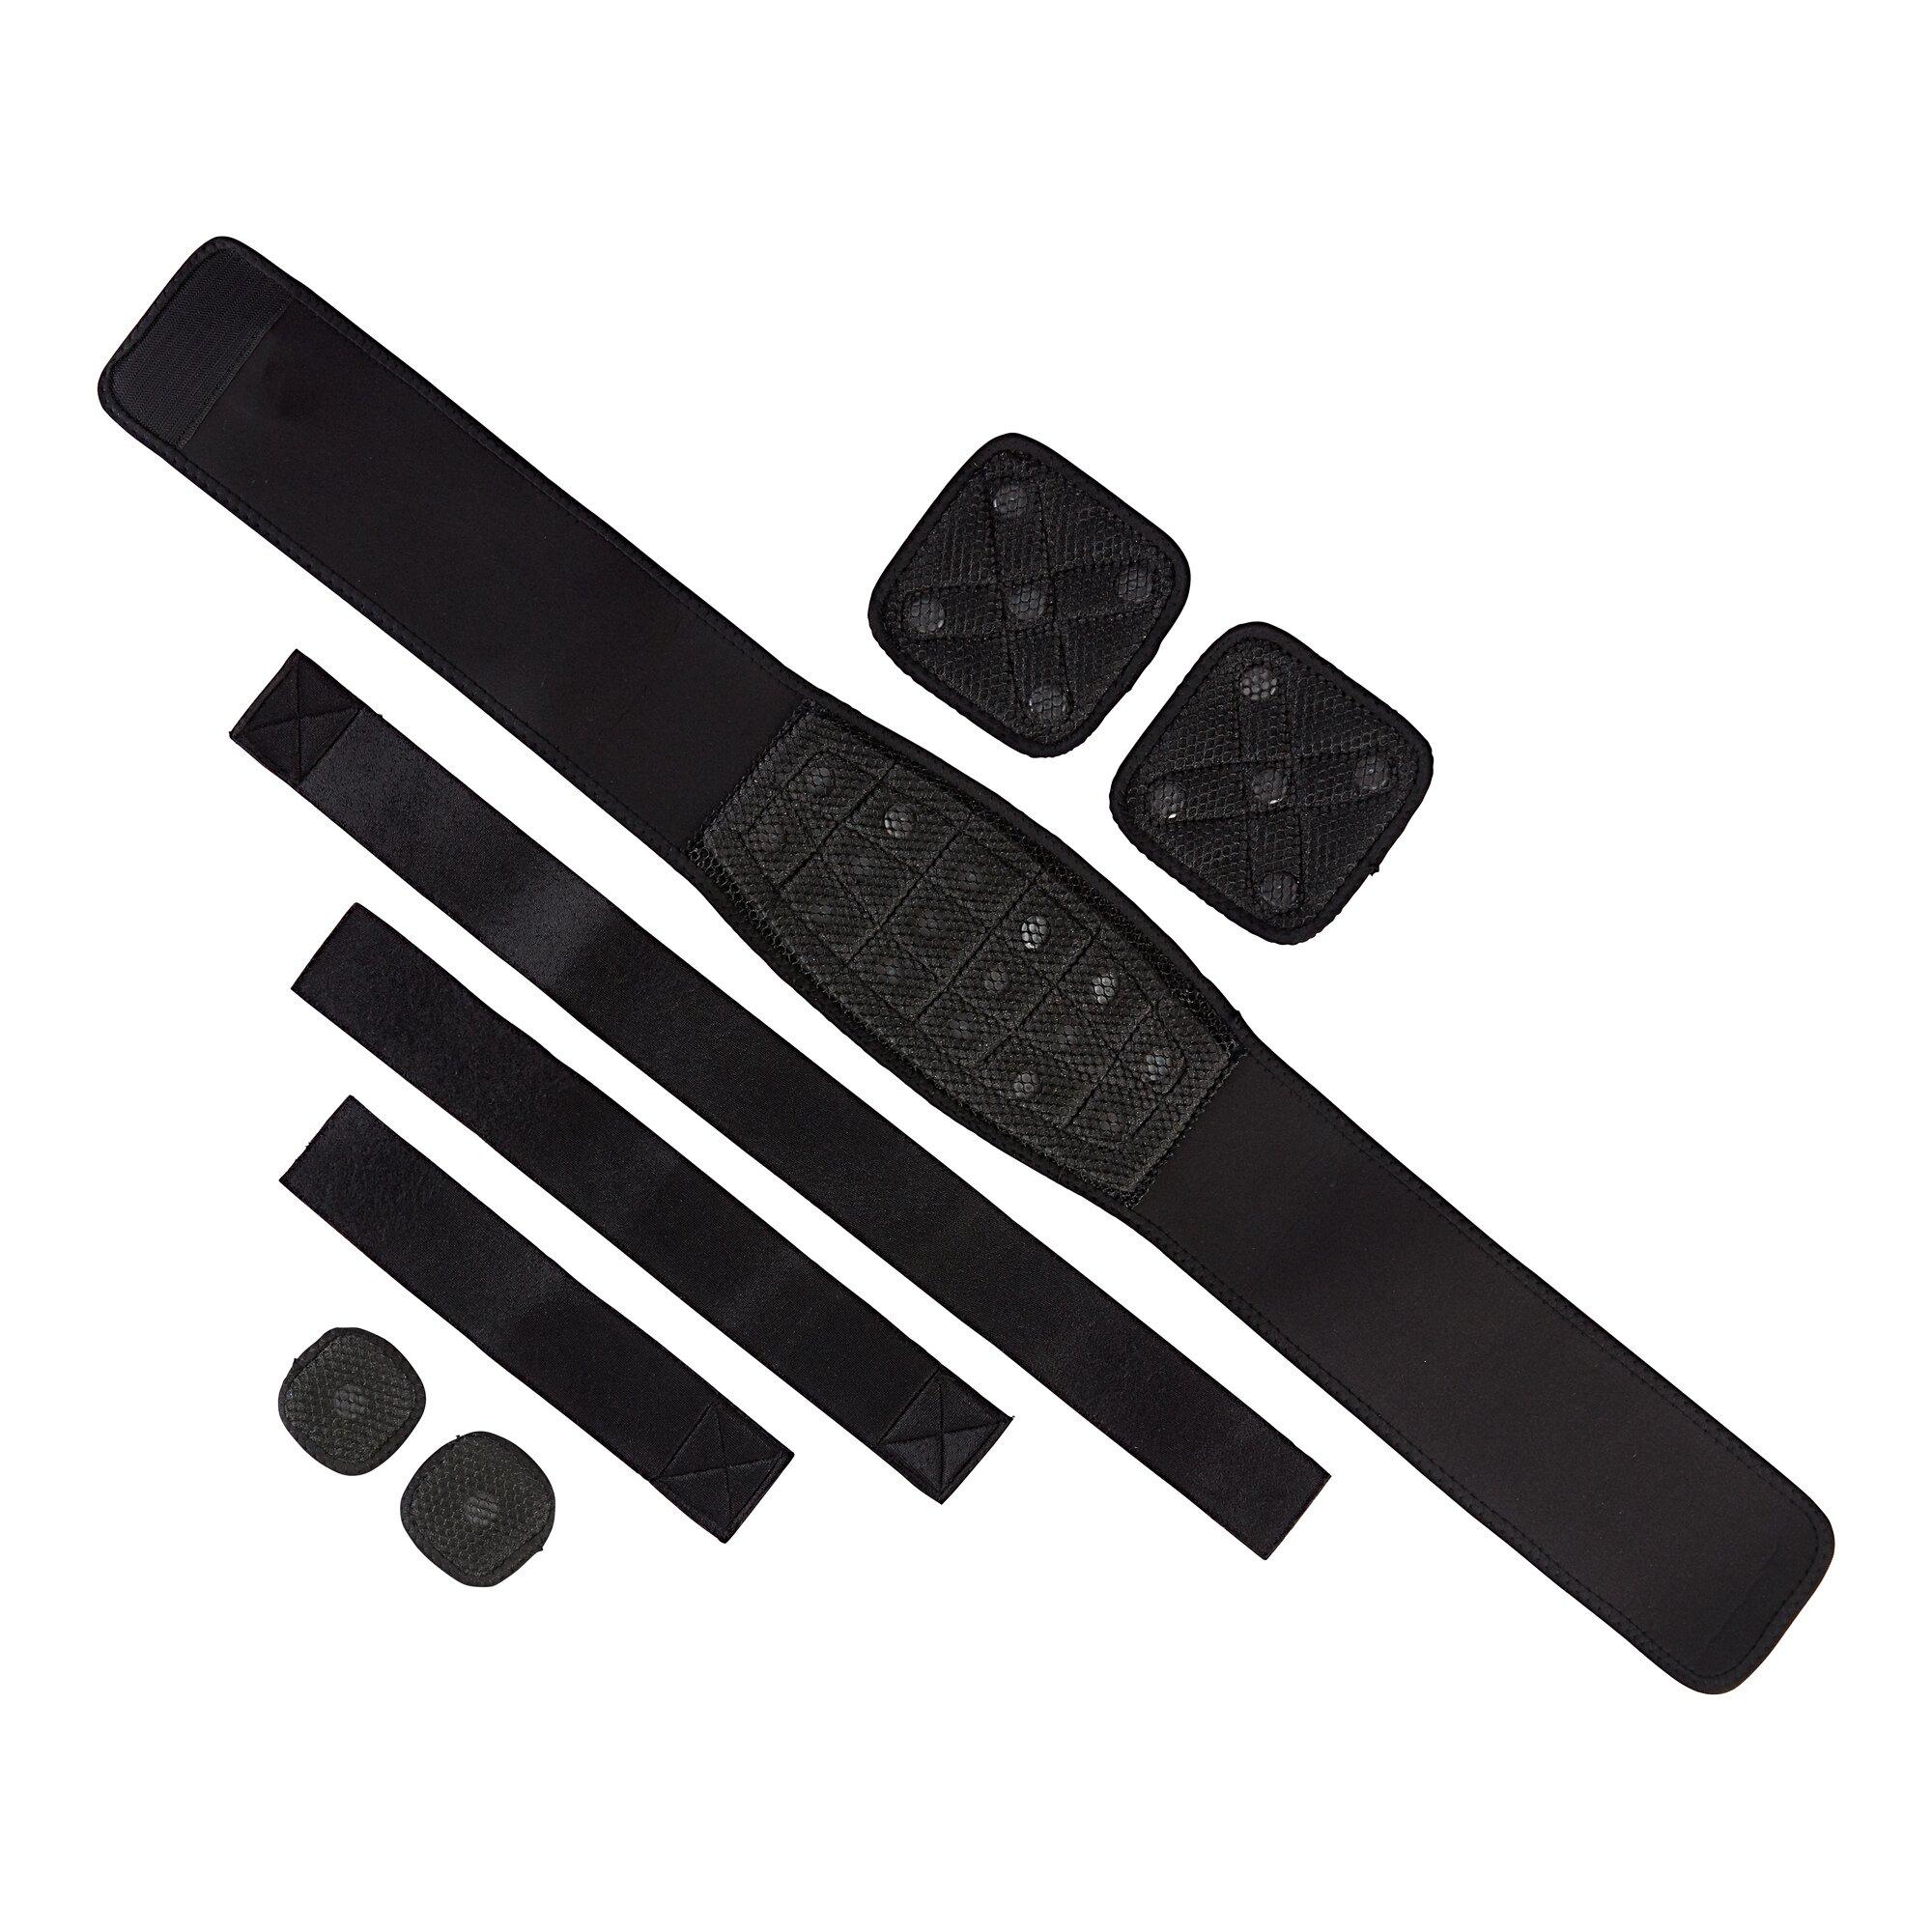 Image of mayenVITAL® Magnet-Bandagen-Set, 8 Teile